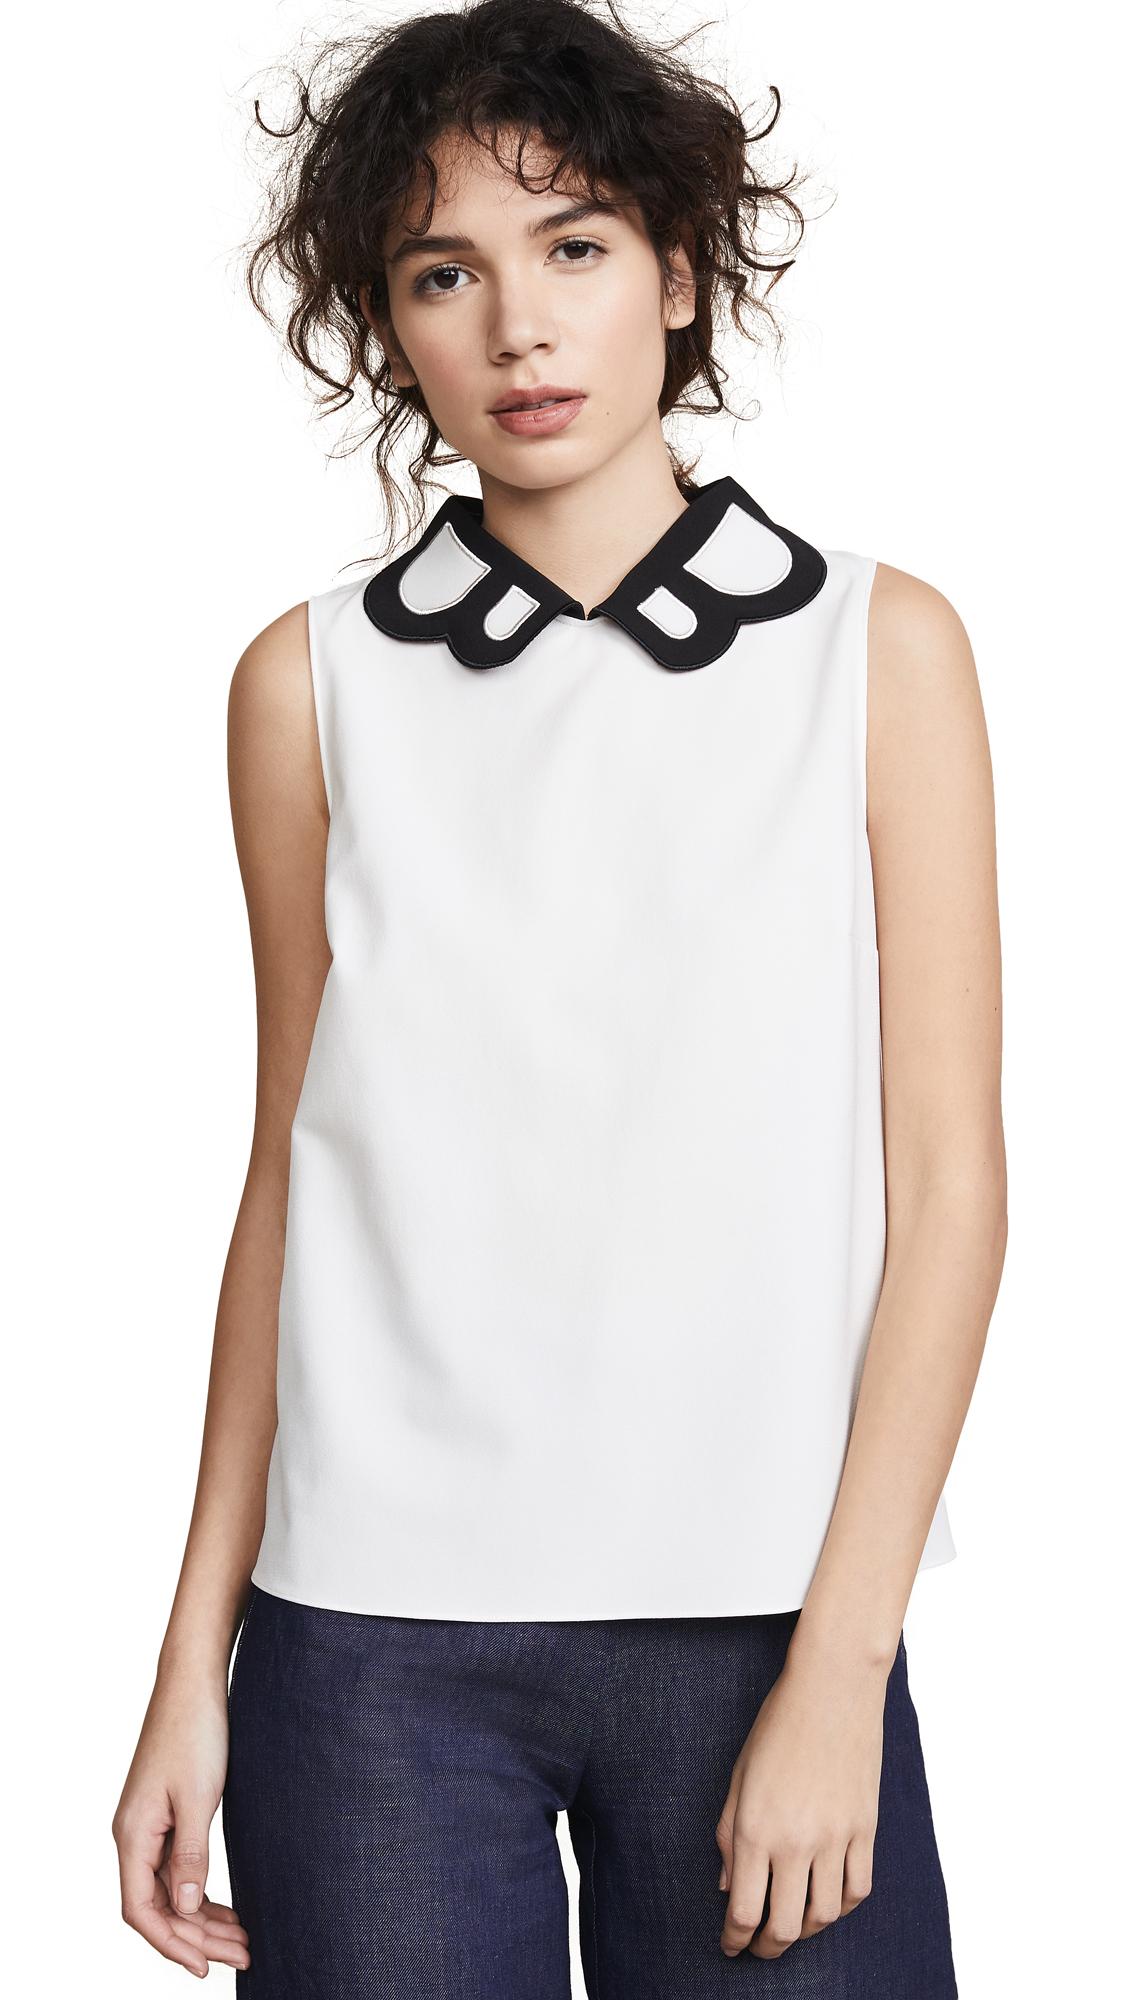 Boutique Moschino Collared Blouse - White/Black